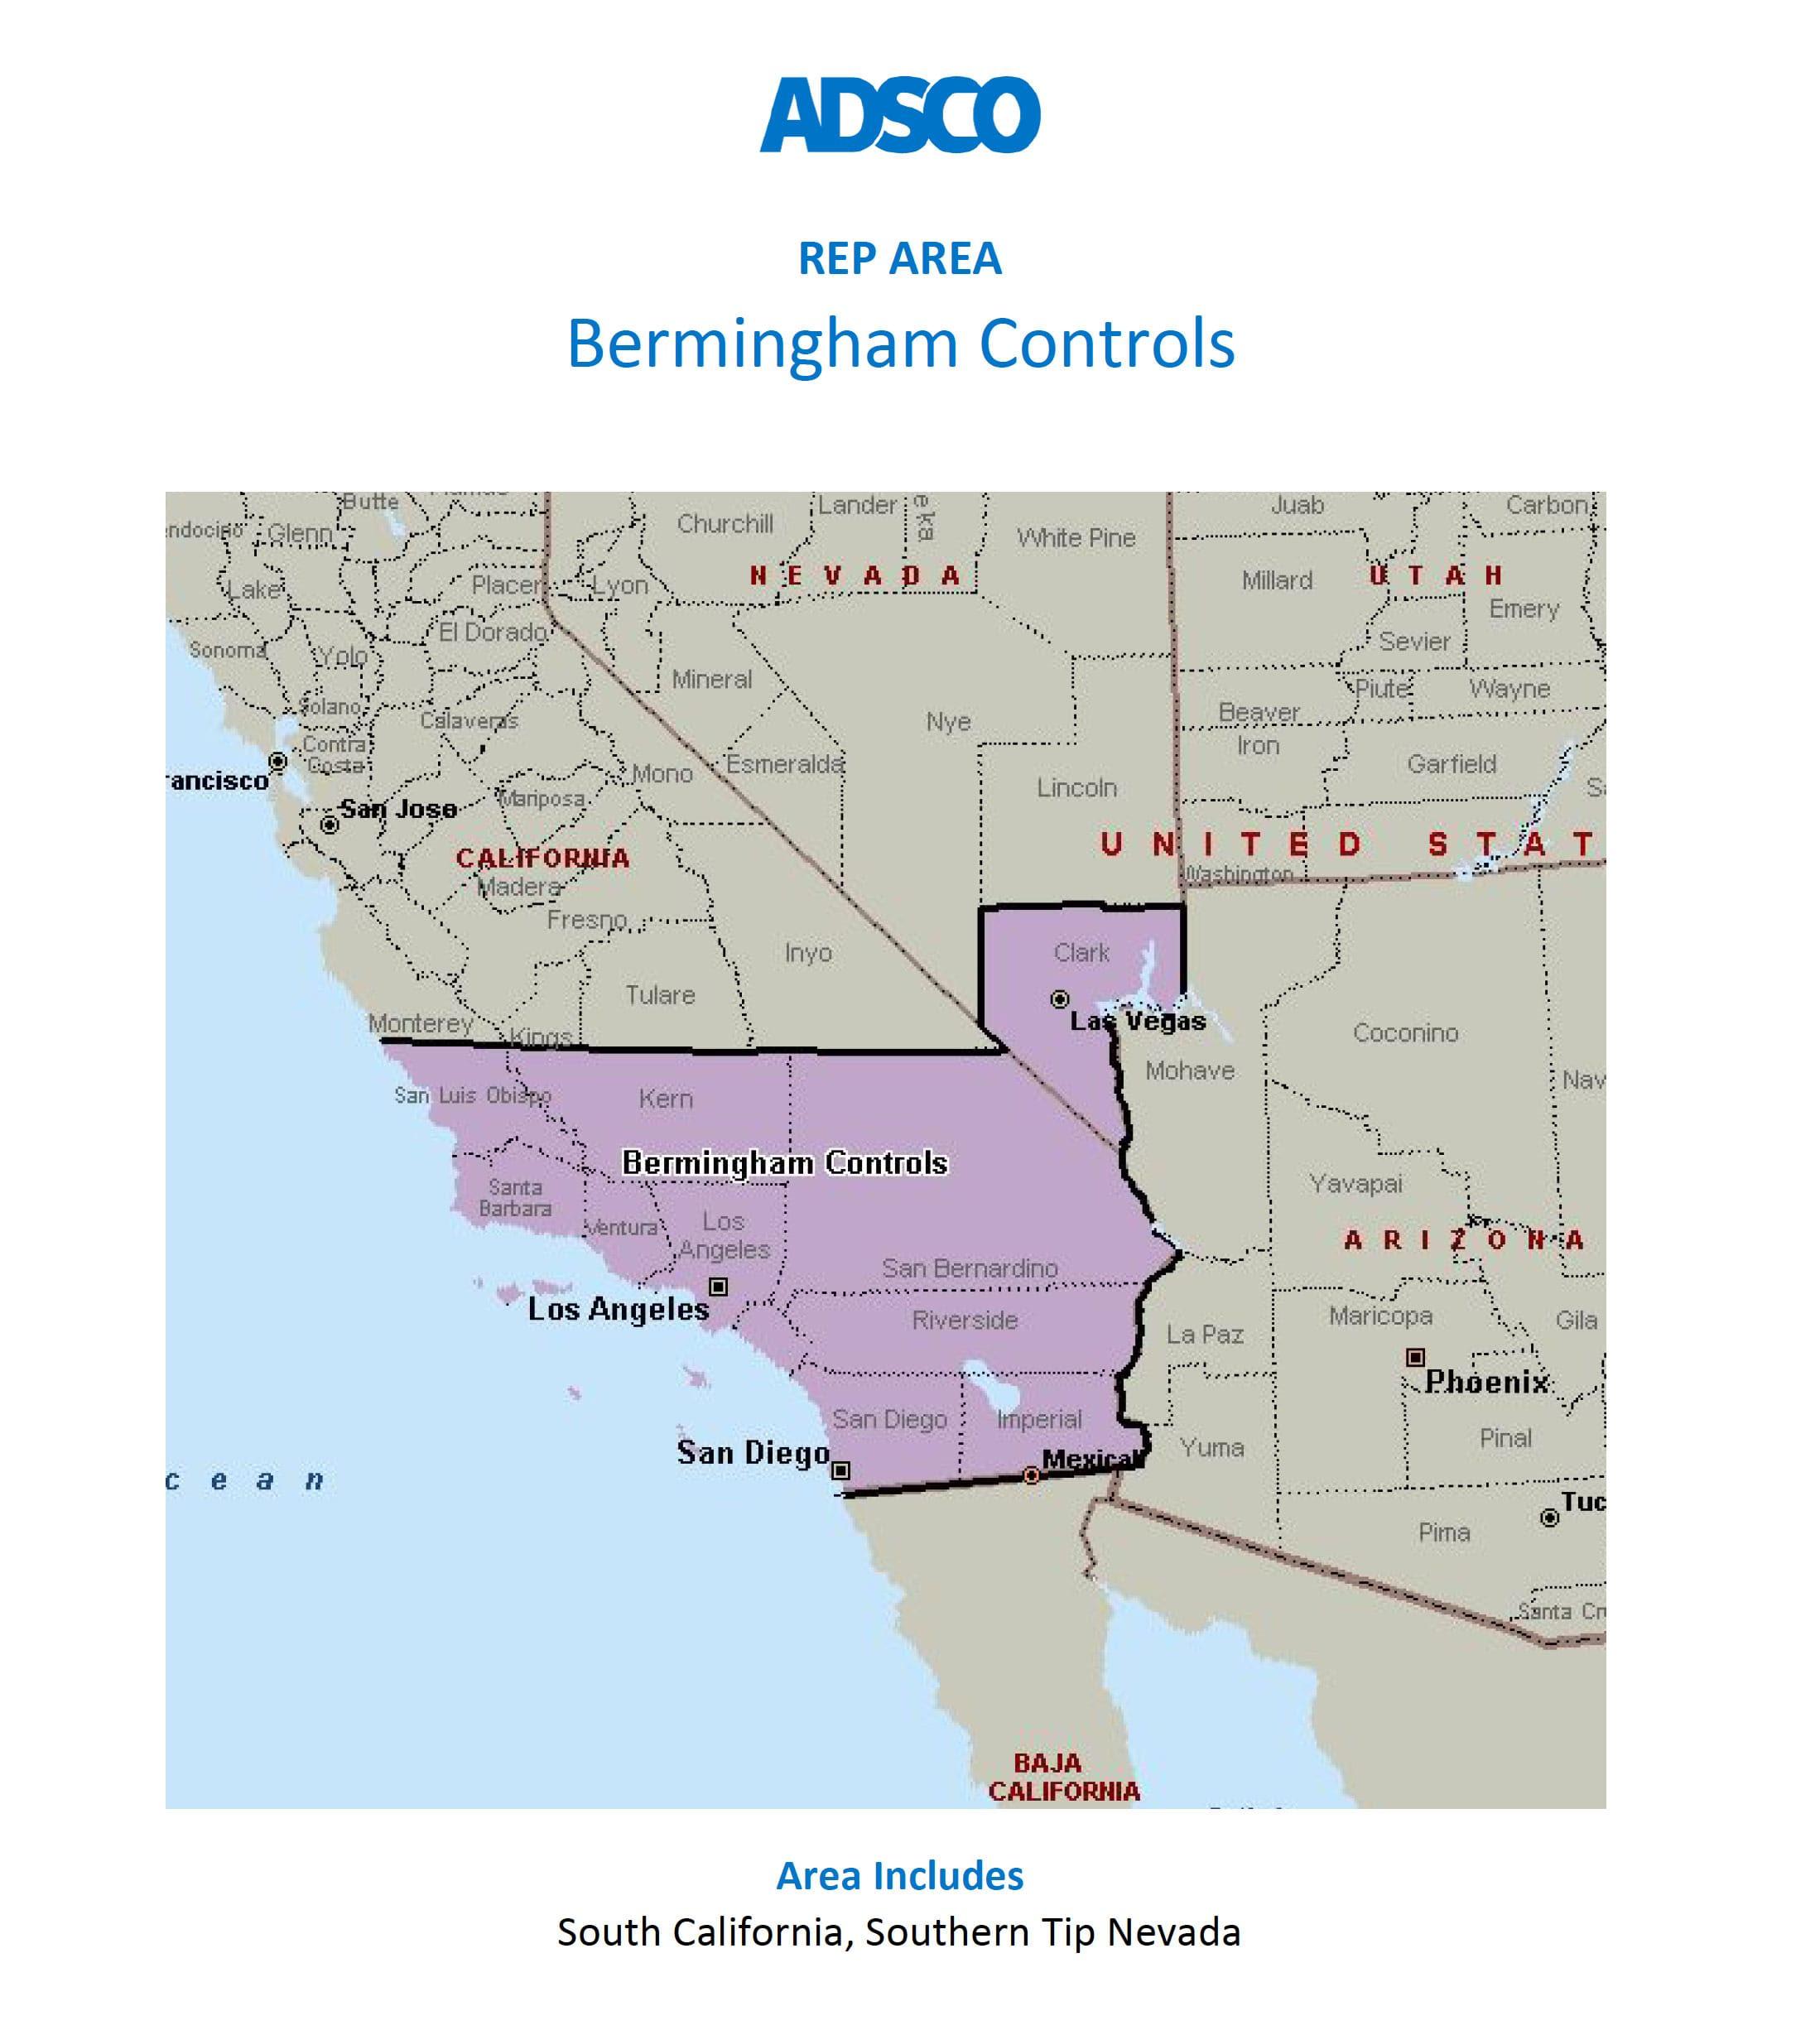 ADSCO Rep Bermingham Controls